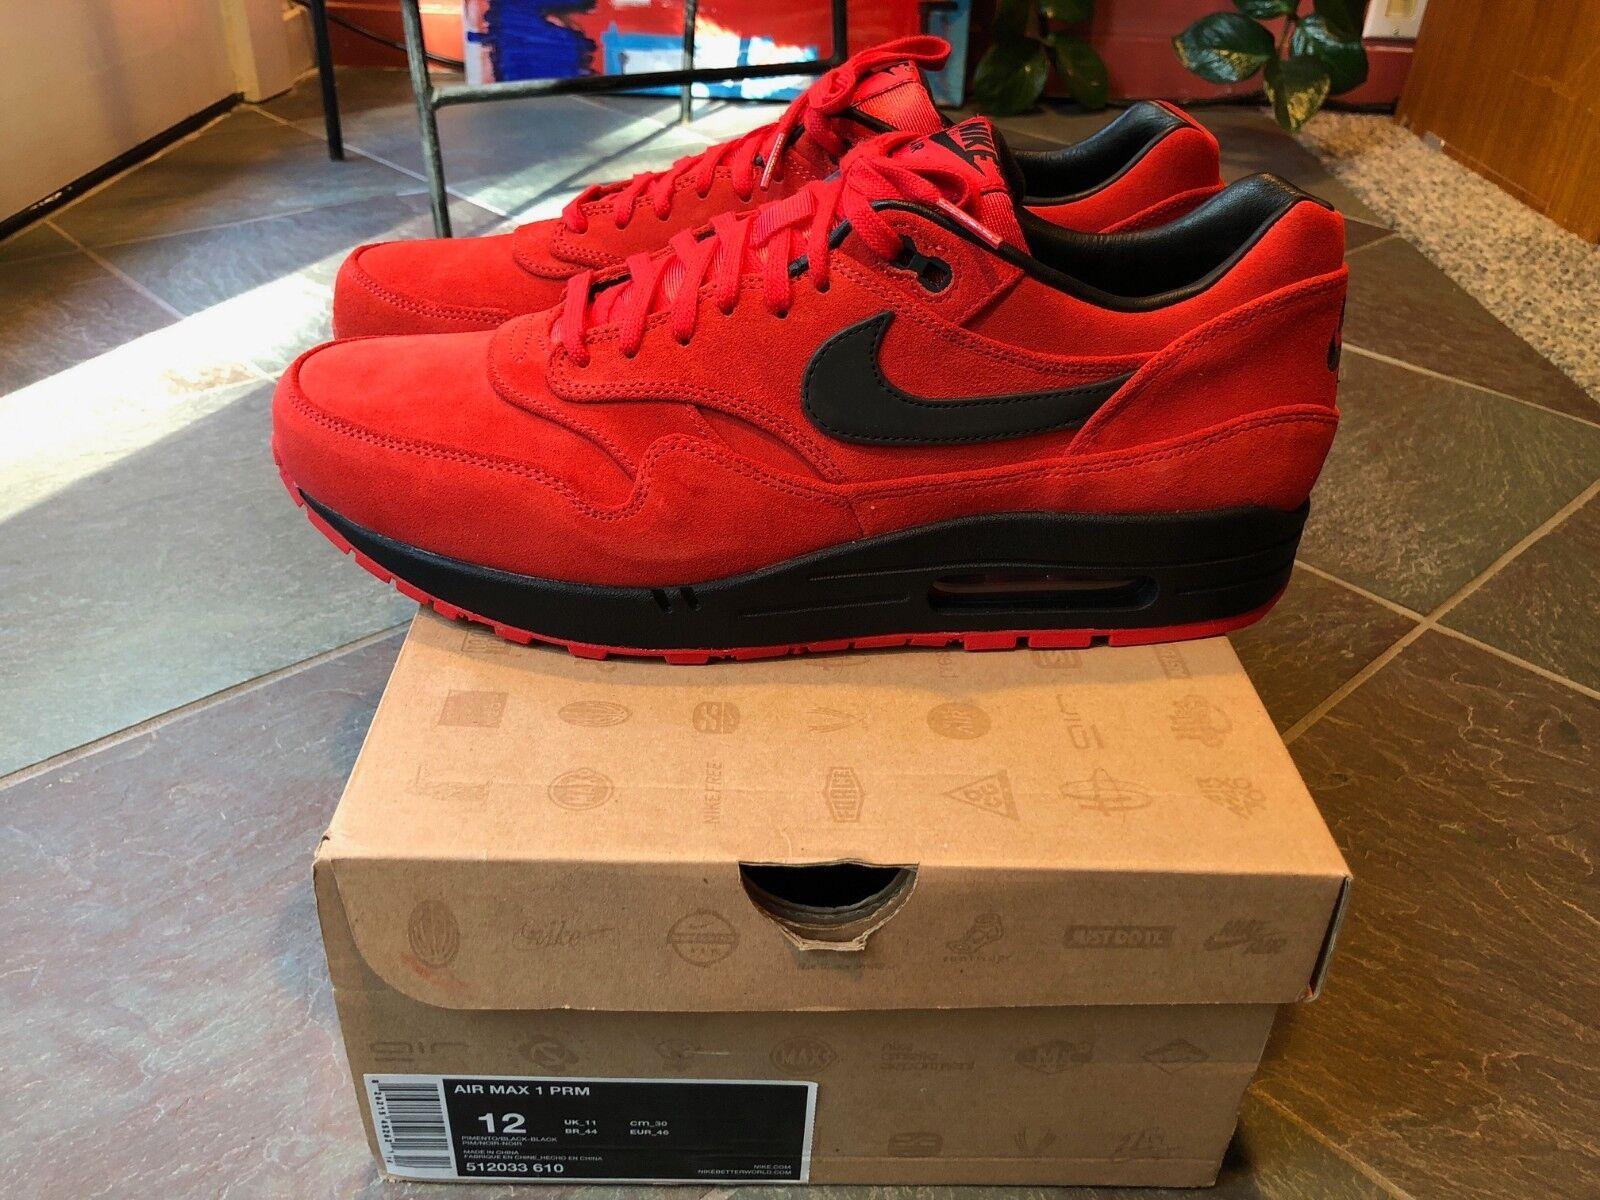 2012 Nike Air Max 1 PRM Premium Pimento Red Nero 3M size 12